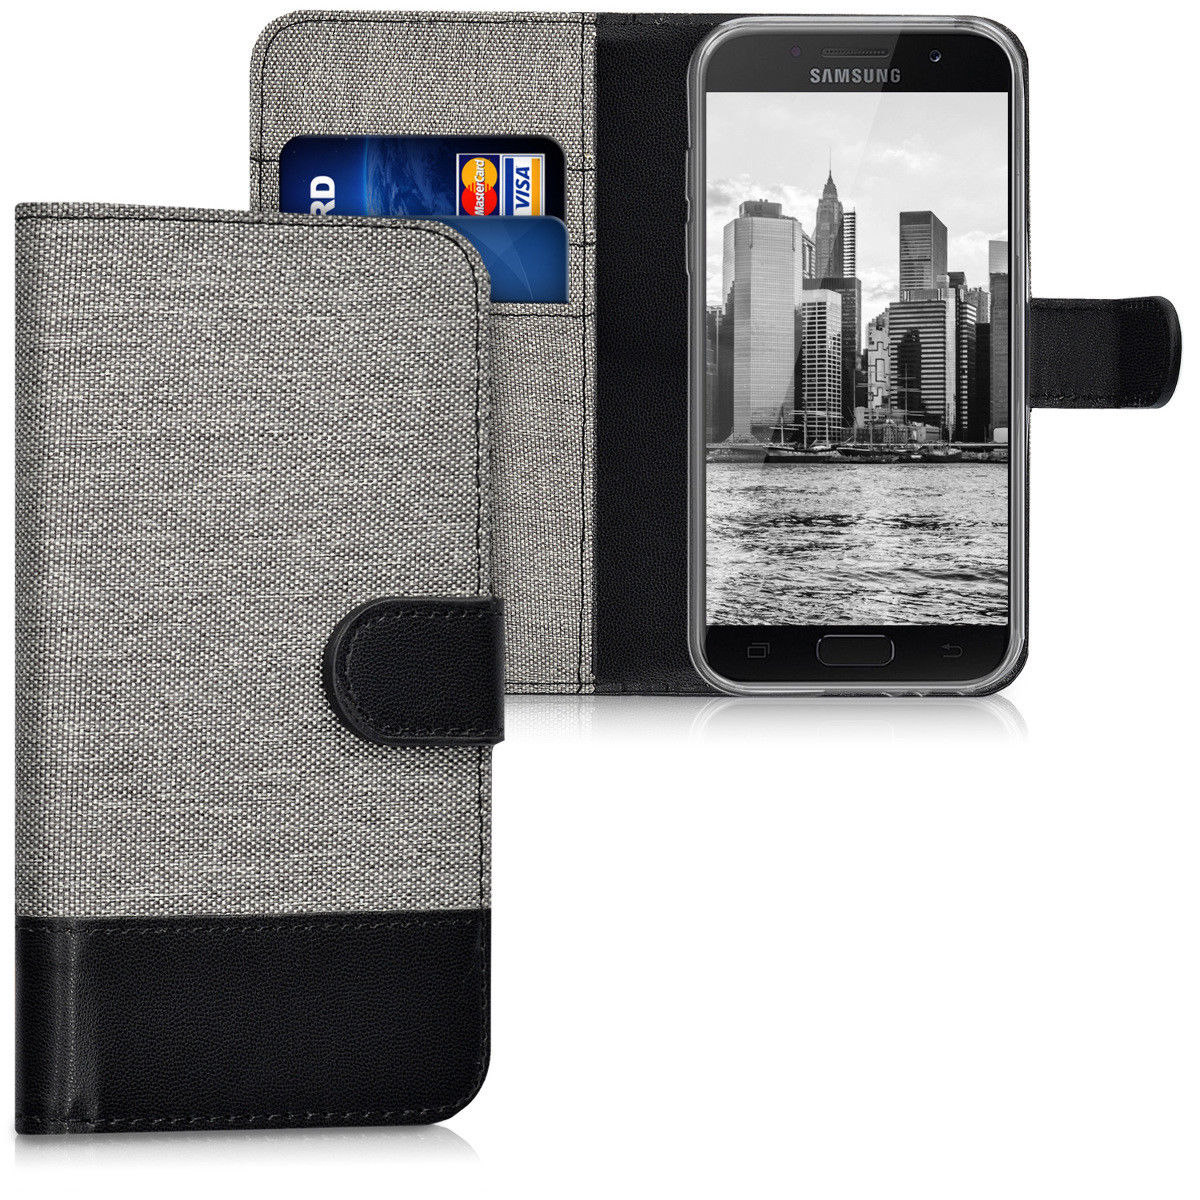 Pouzdro pro Samsung Galaxy A3 (2017) šedé